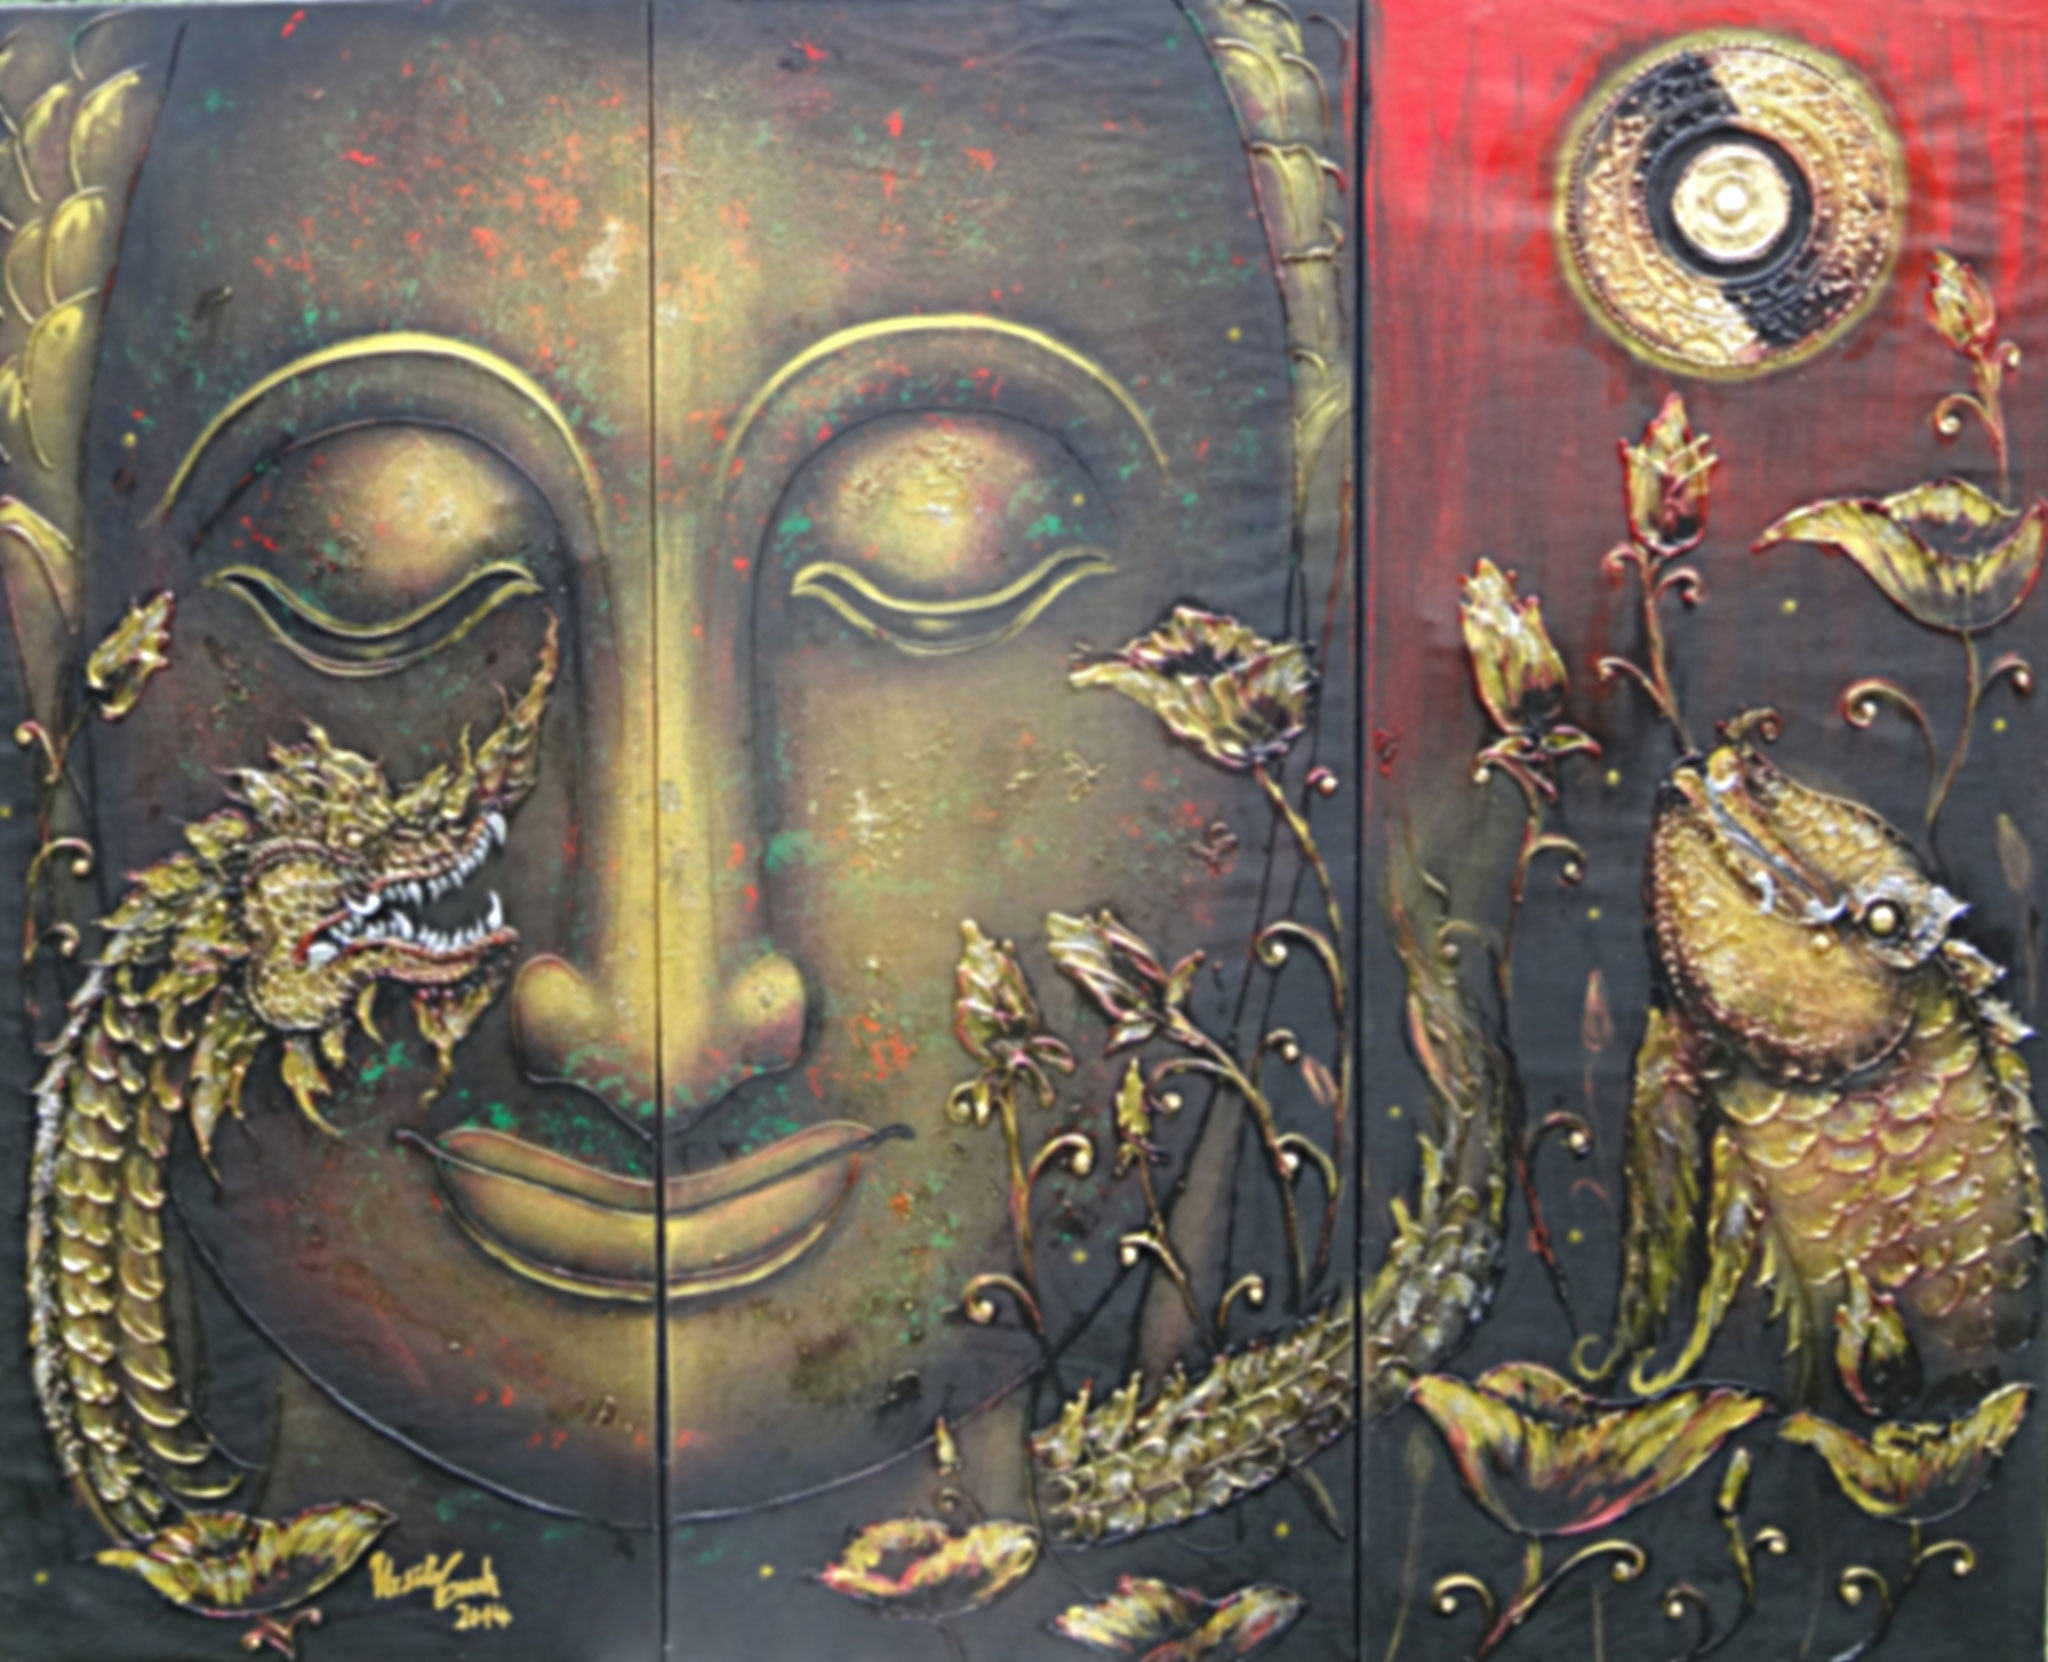 Buddha und der Mythus (Technik: Öl/Acryl auf Leinwand 1,66 m X 1,35 m (dreiteilig))